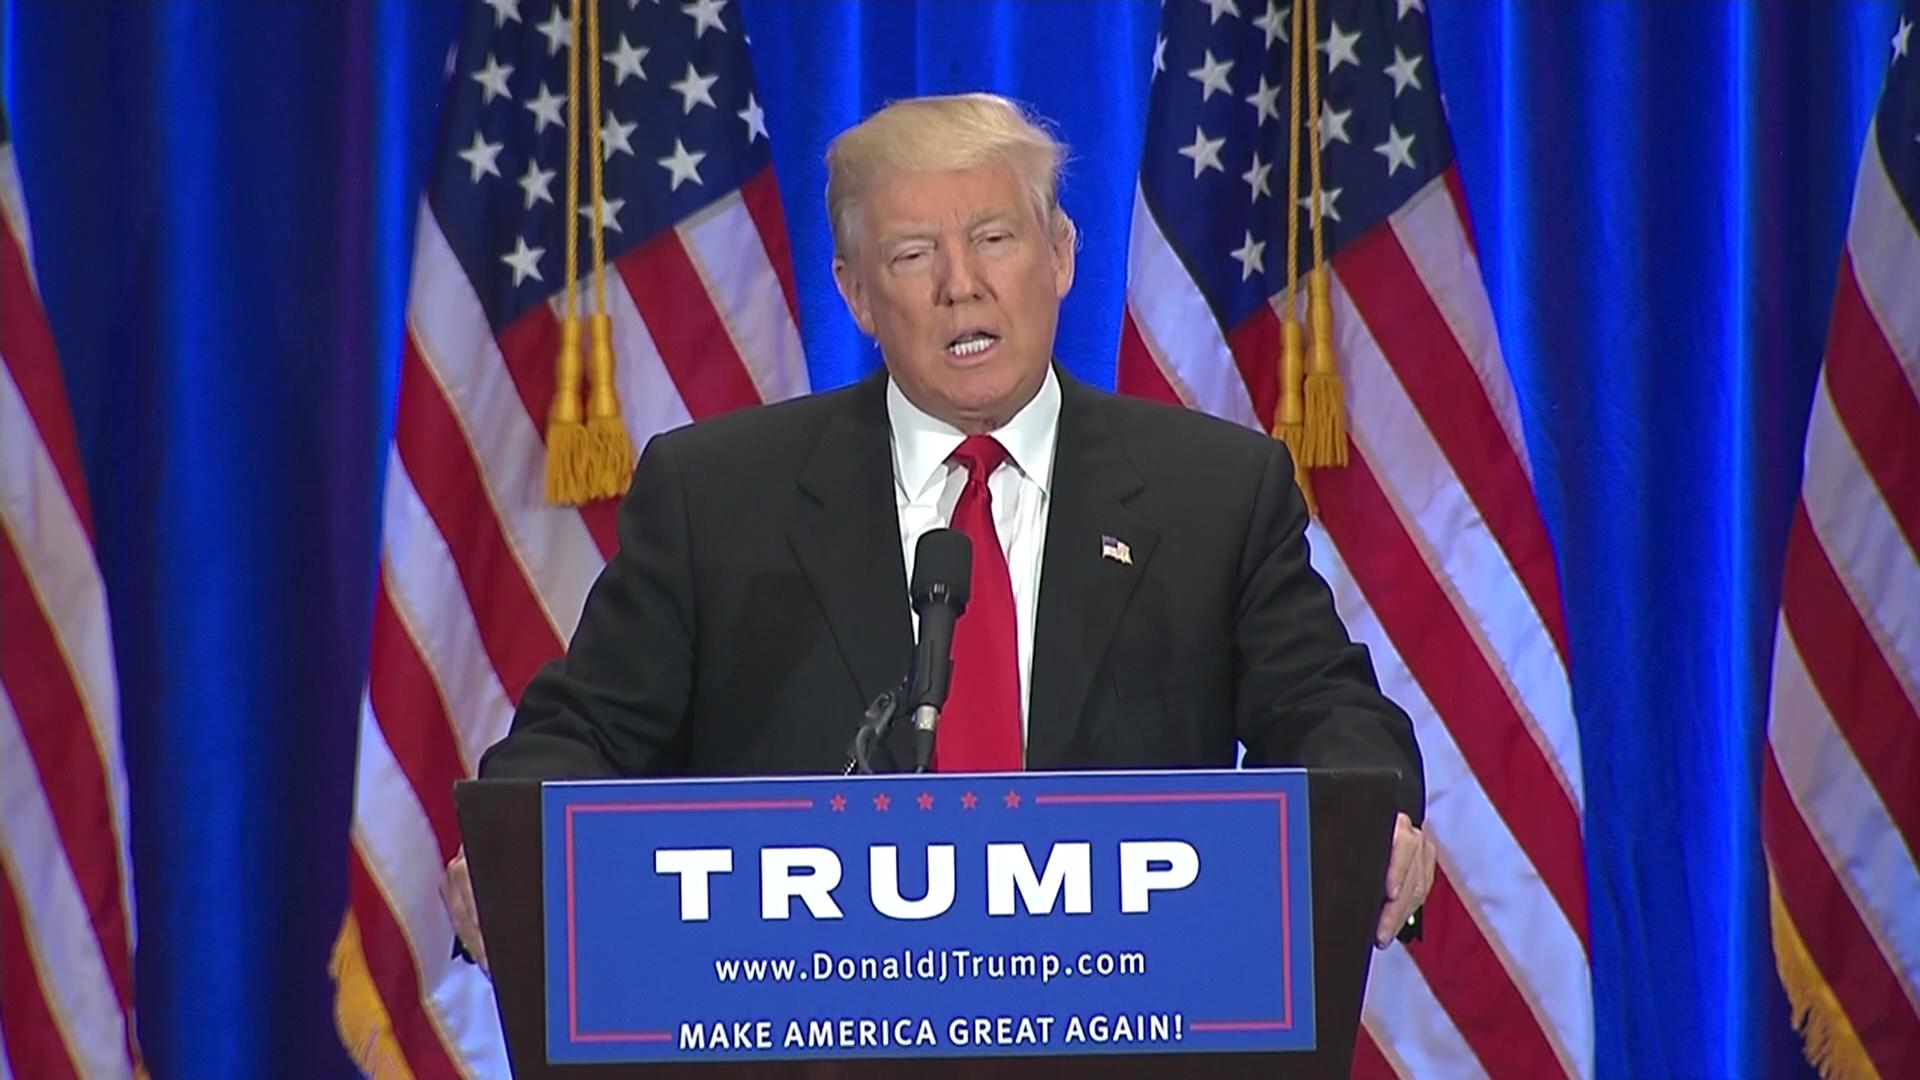 c890ec38 Donald Trump Remarks in New York City | C-SPAN.org